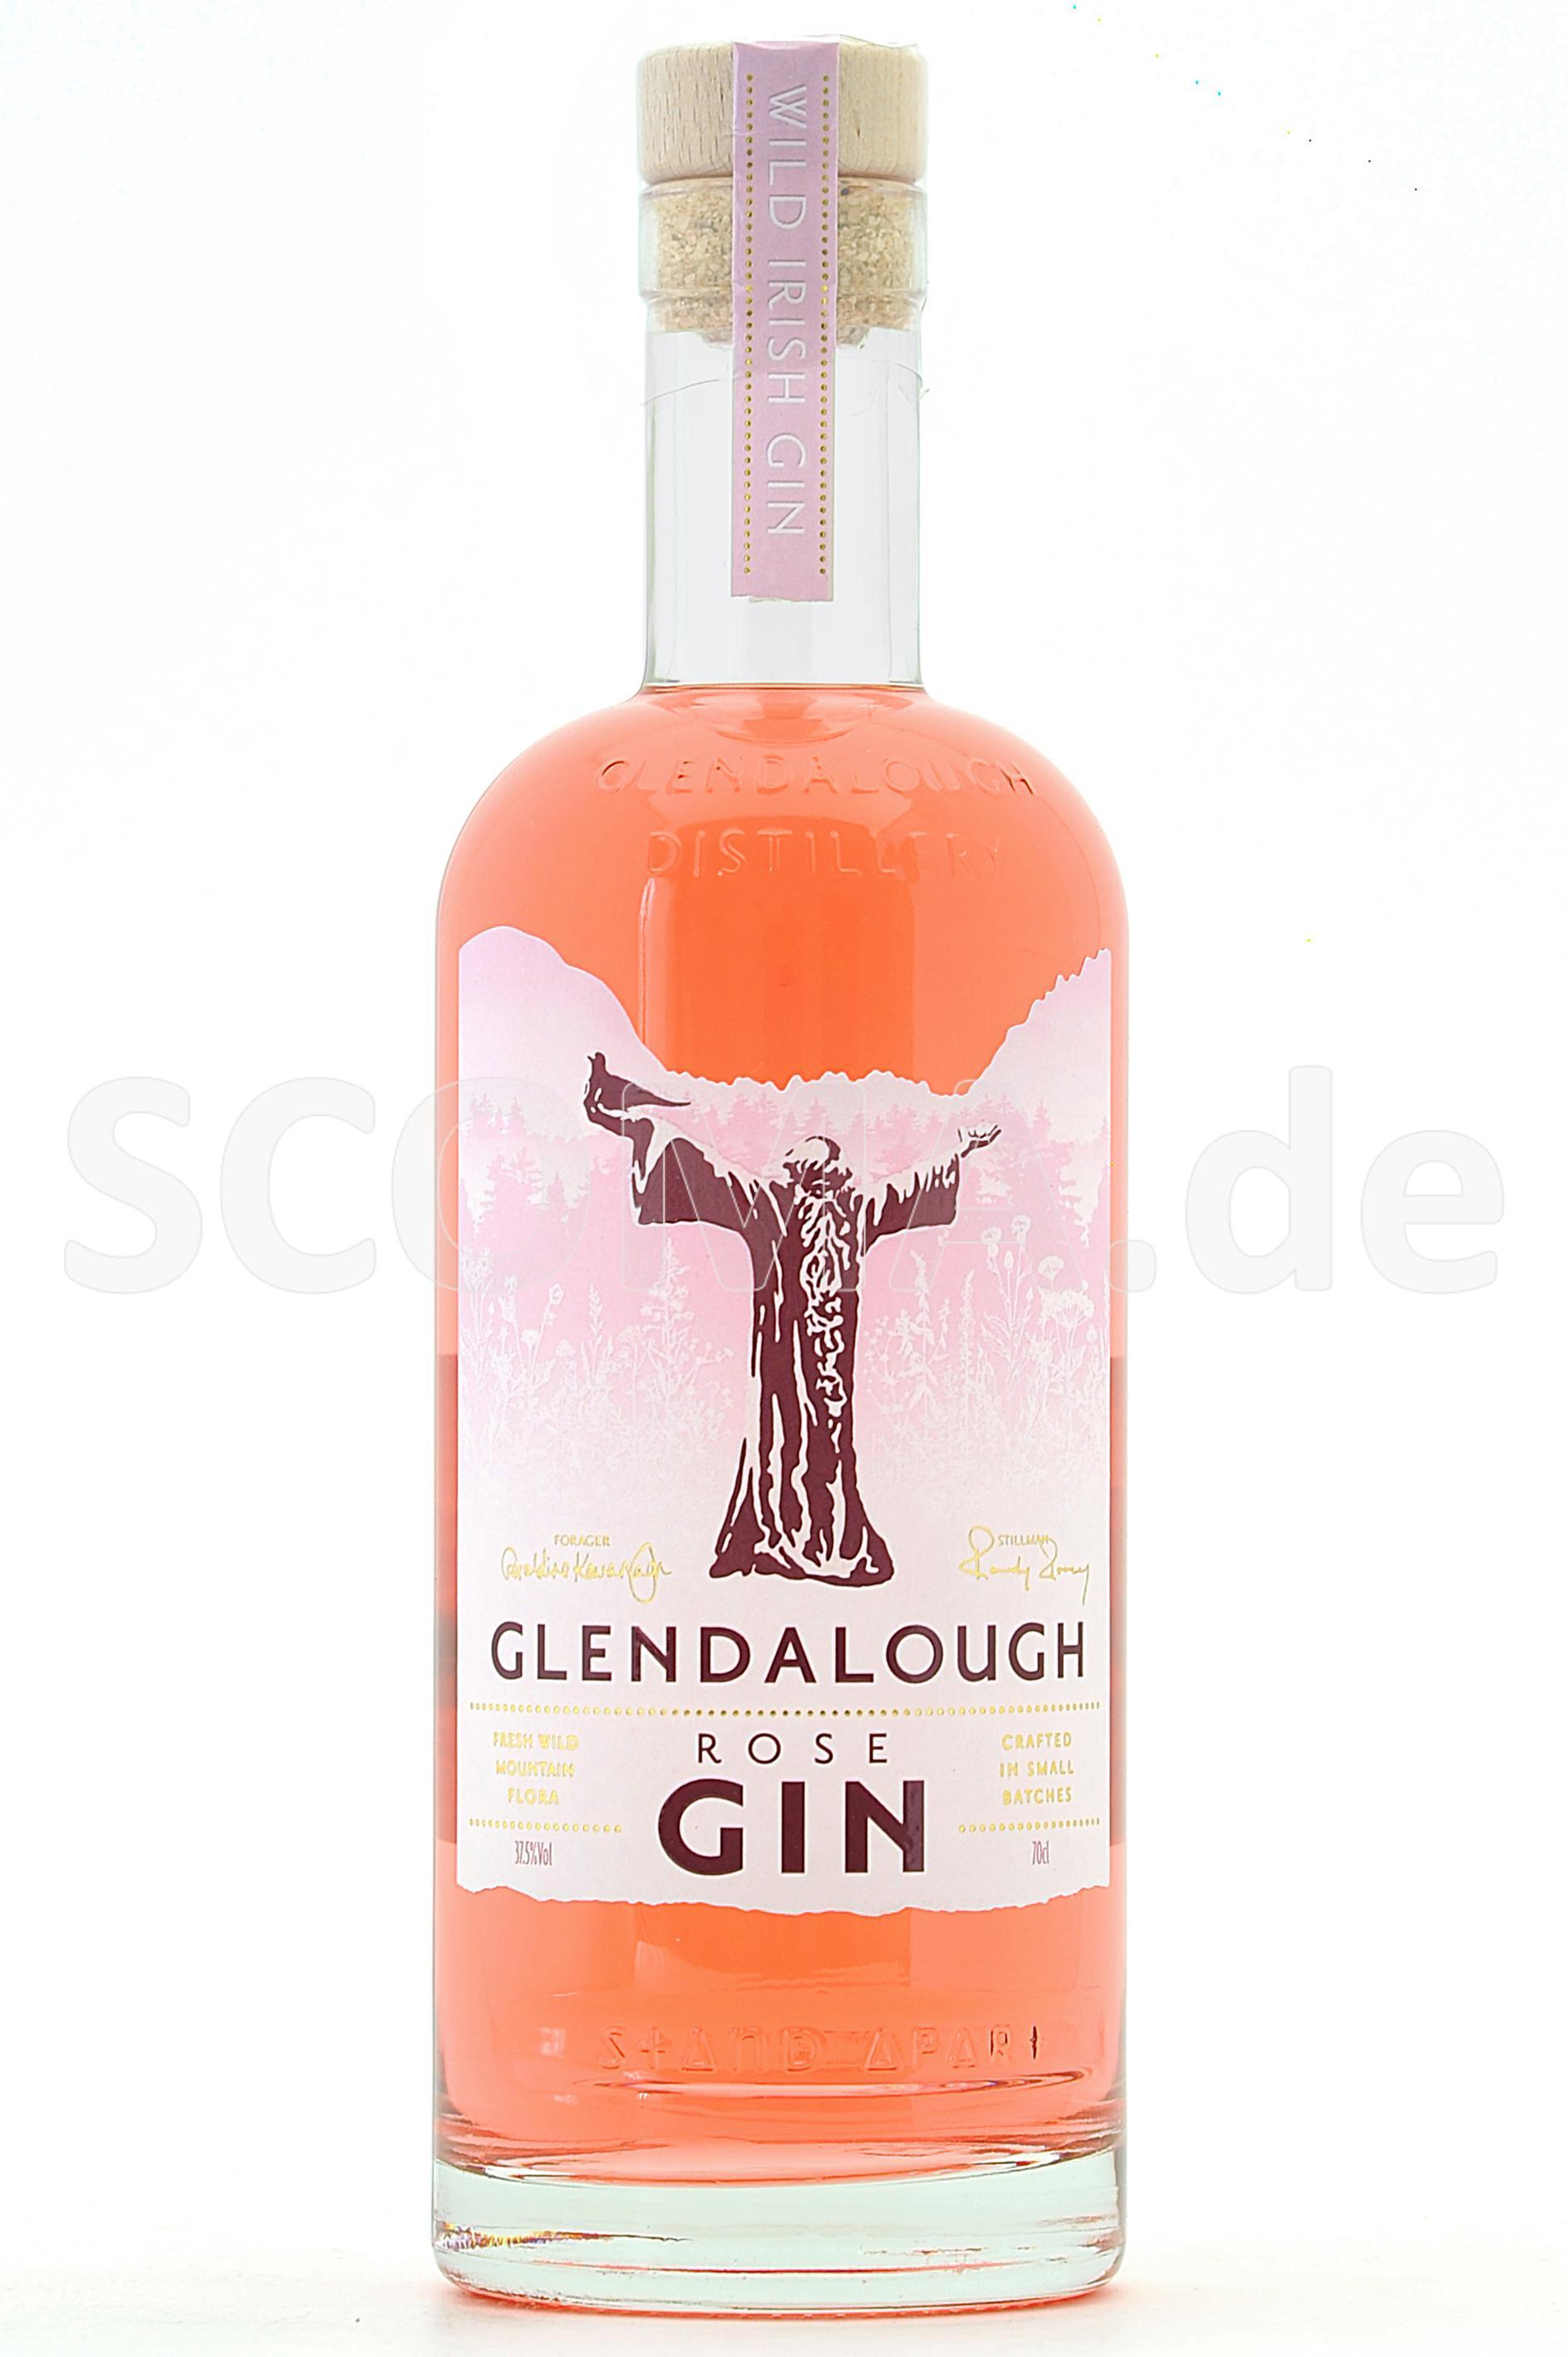 Glendalough Rosa Gin